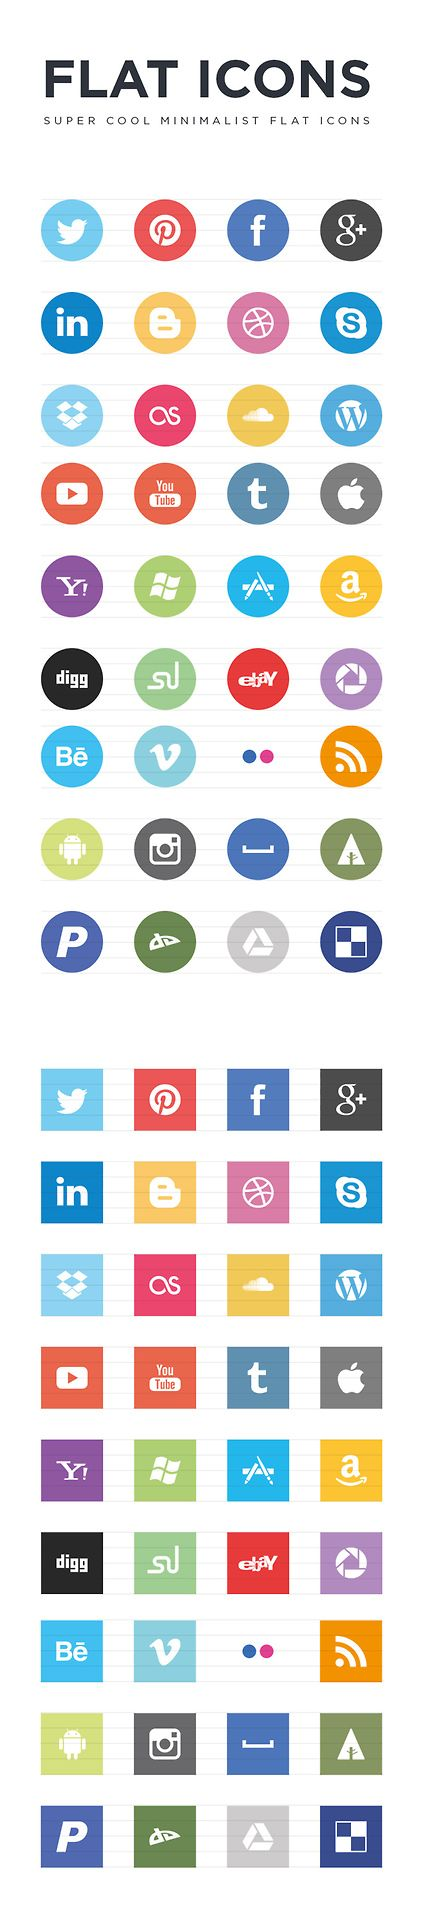 Free Minimalist Flat Social Icons via Web Design Freebies more on http://themeforest.net/?ref=Vision7Studio